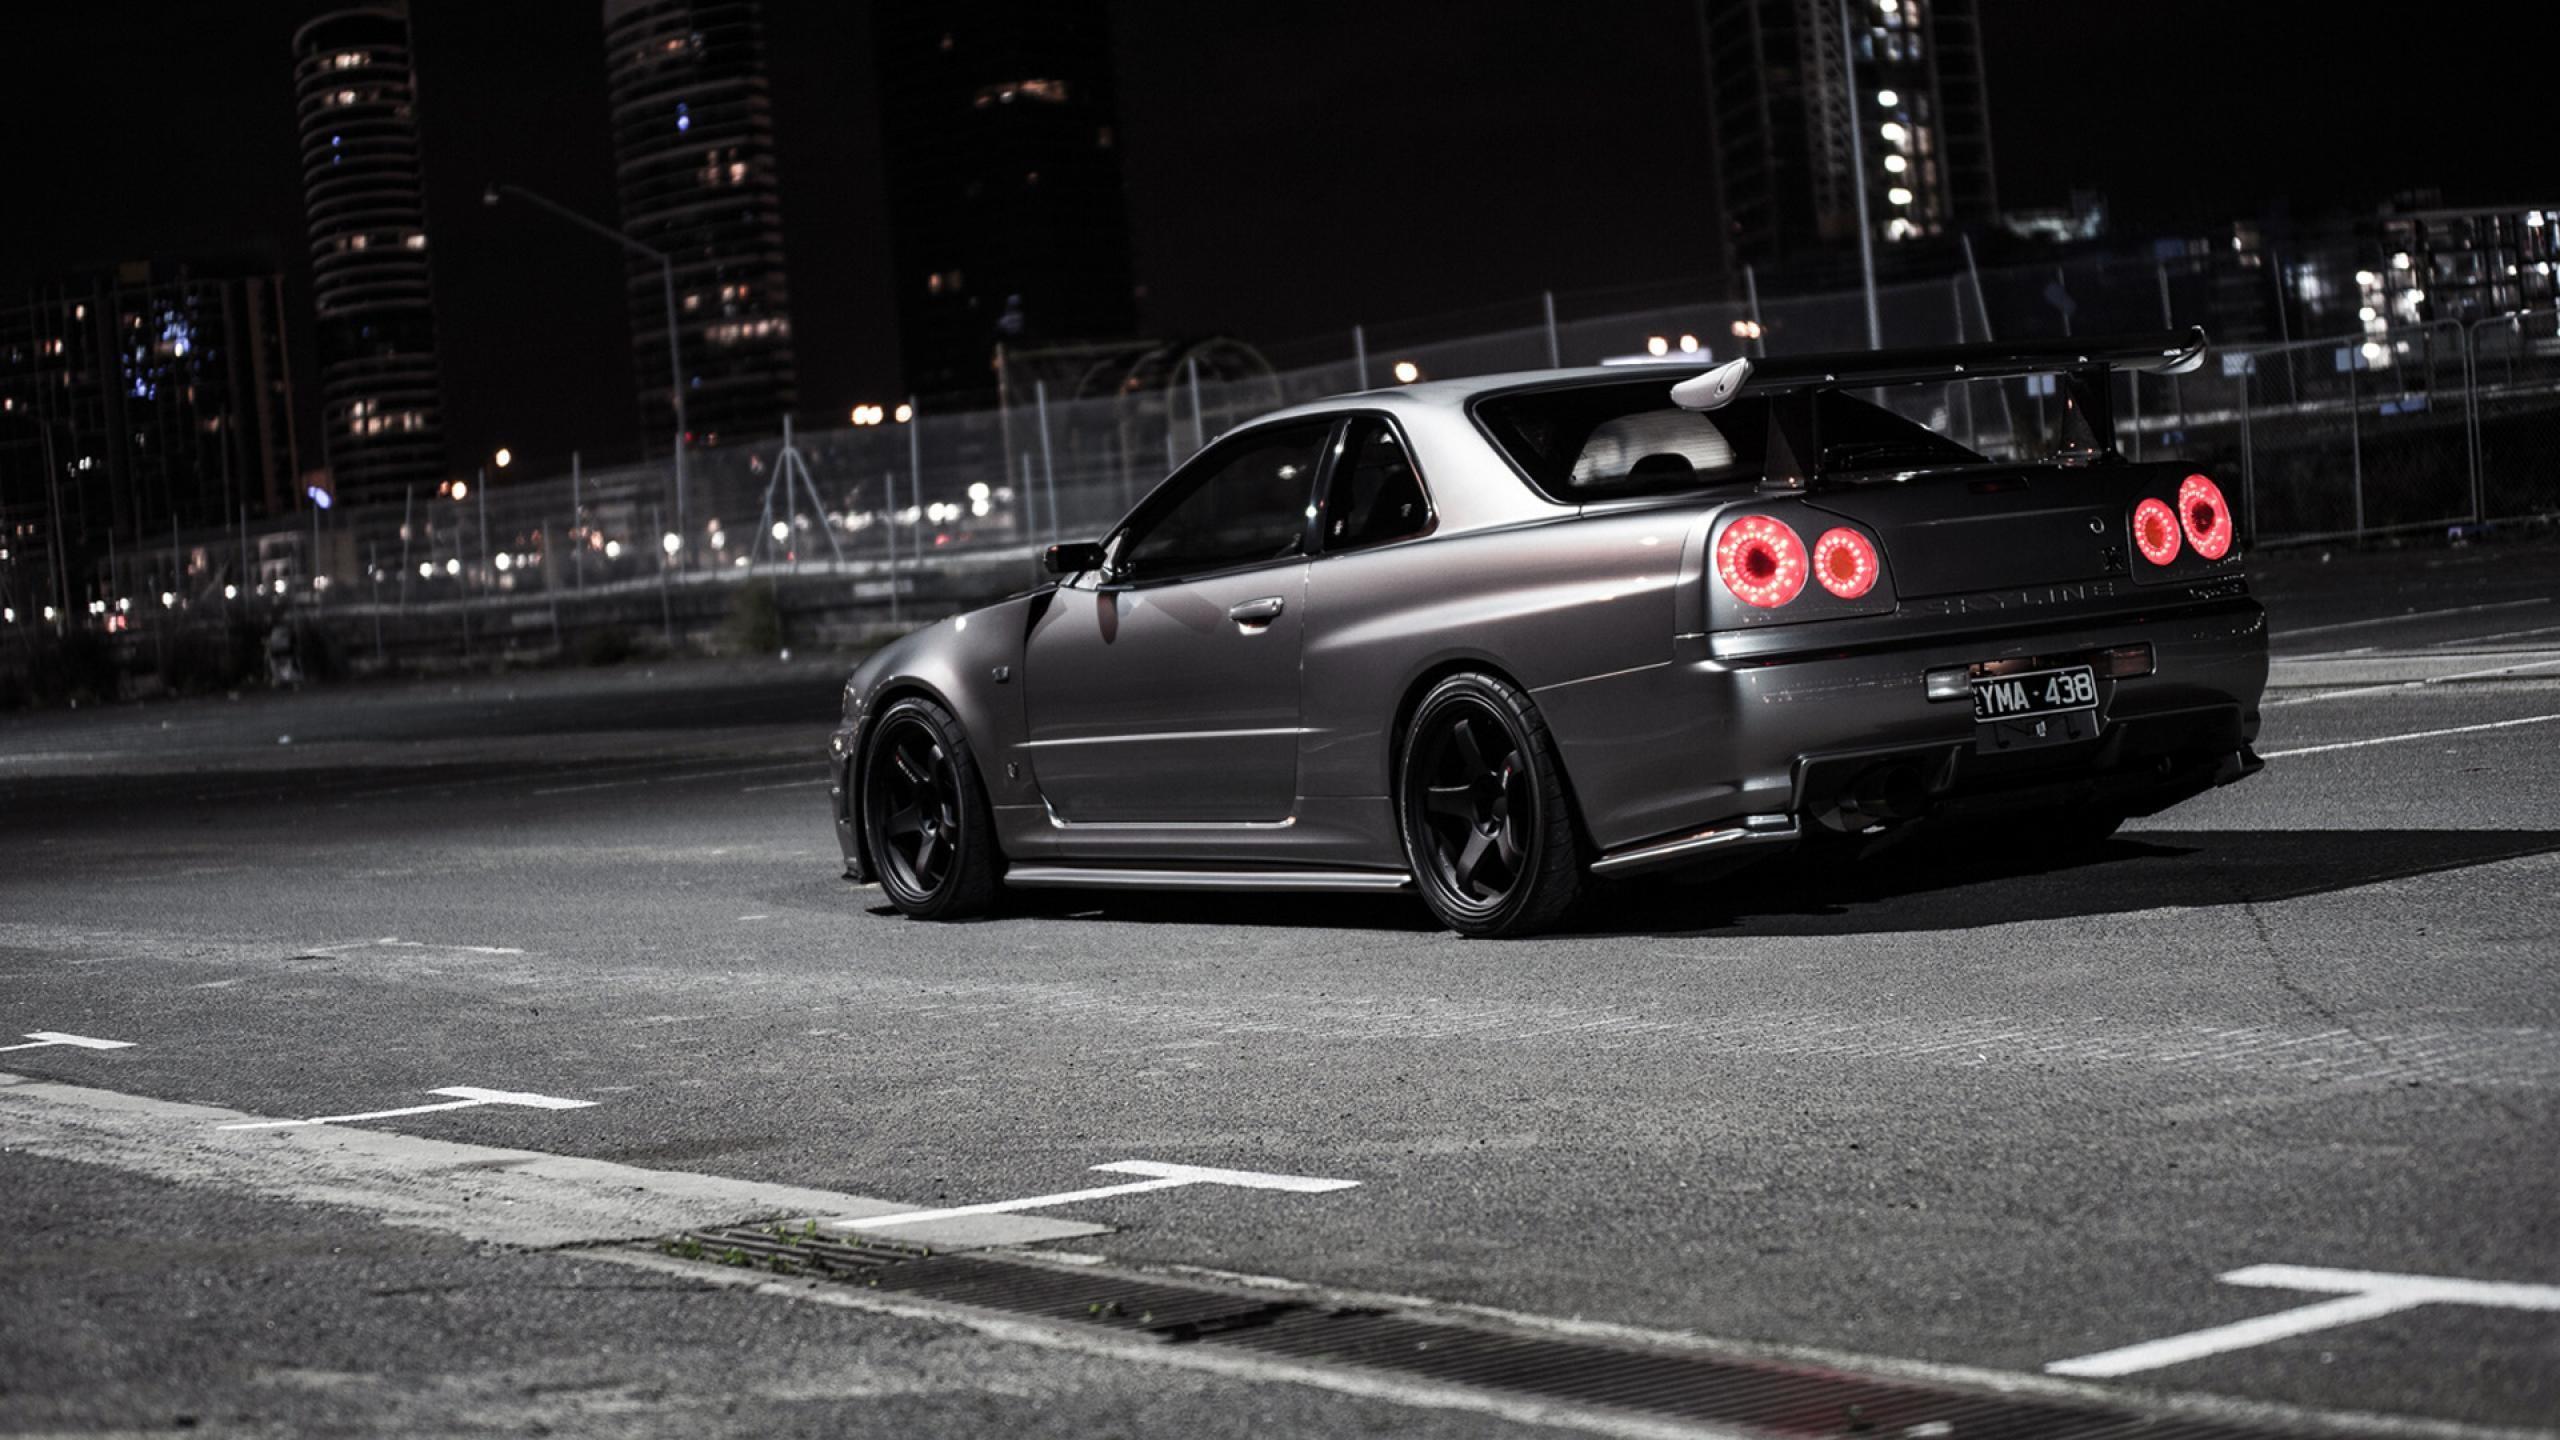 Nissan Skyline Gtr Wallpaper Wallpapertag